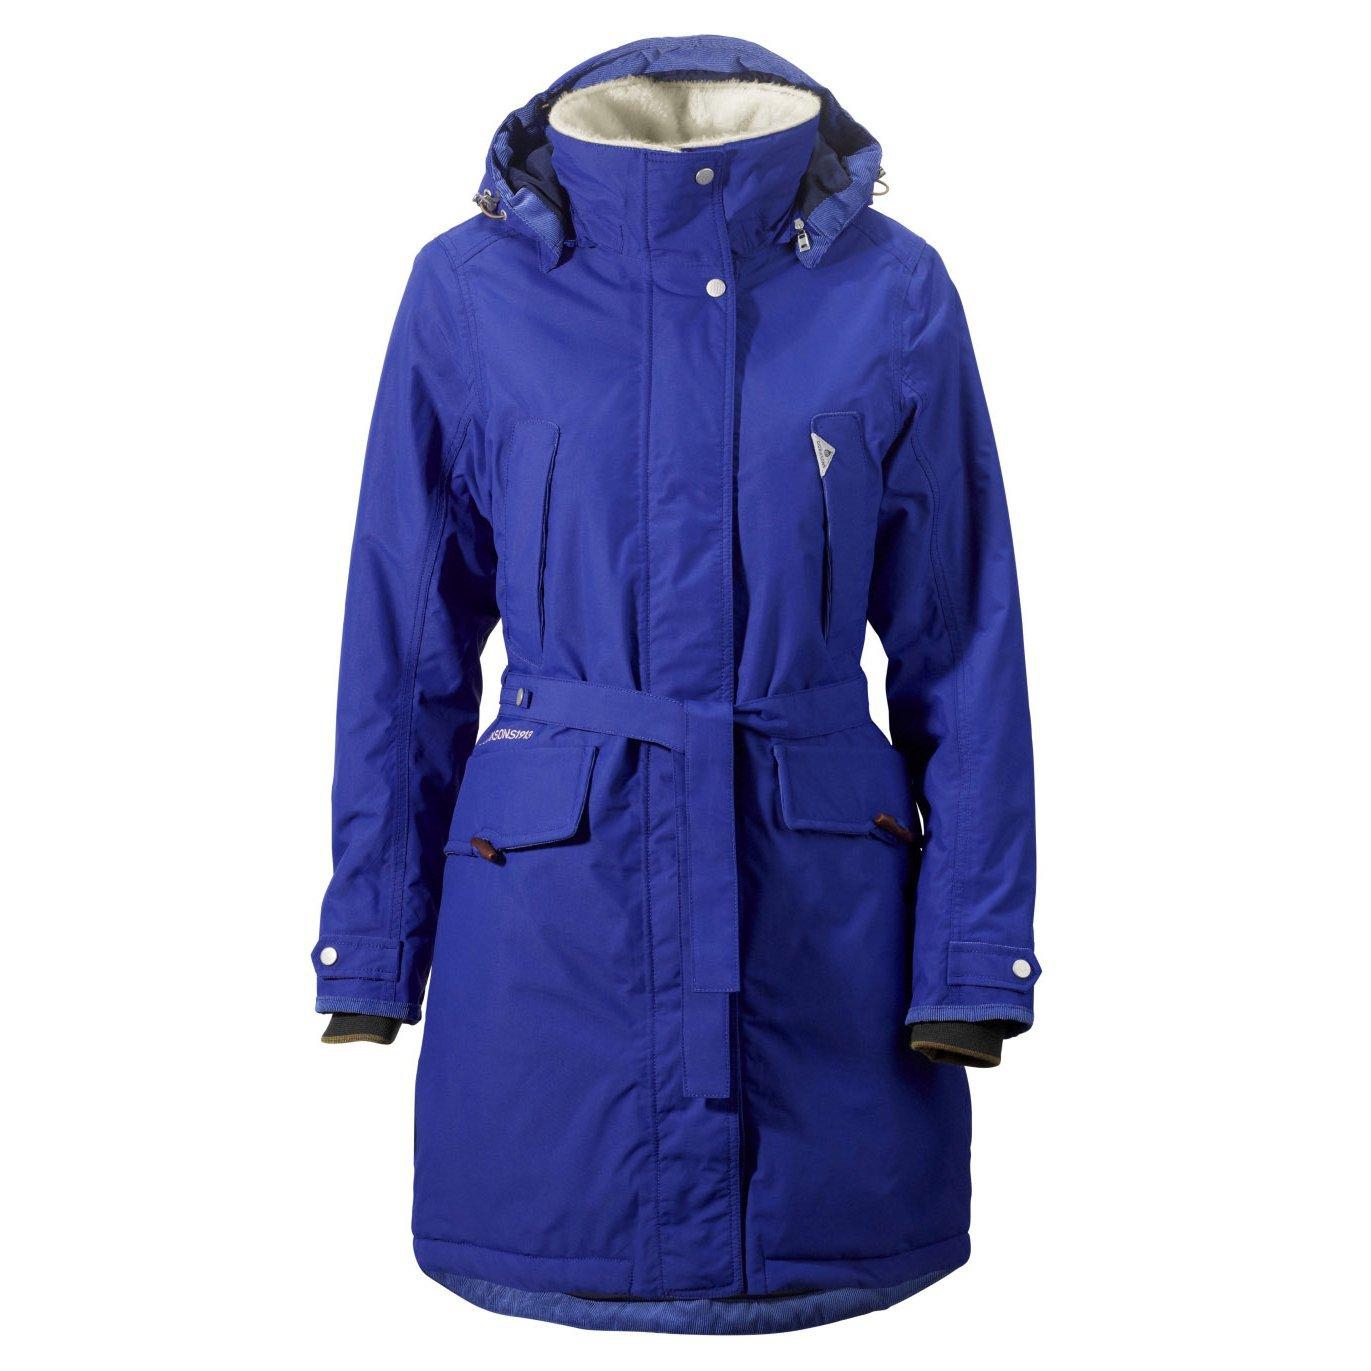 Куртка DIDRIKSONS1913 MILO KIDS JKT 500408, размер 100 см, цвет 279 лавандовый